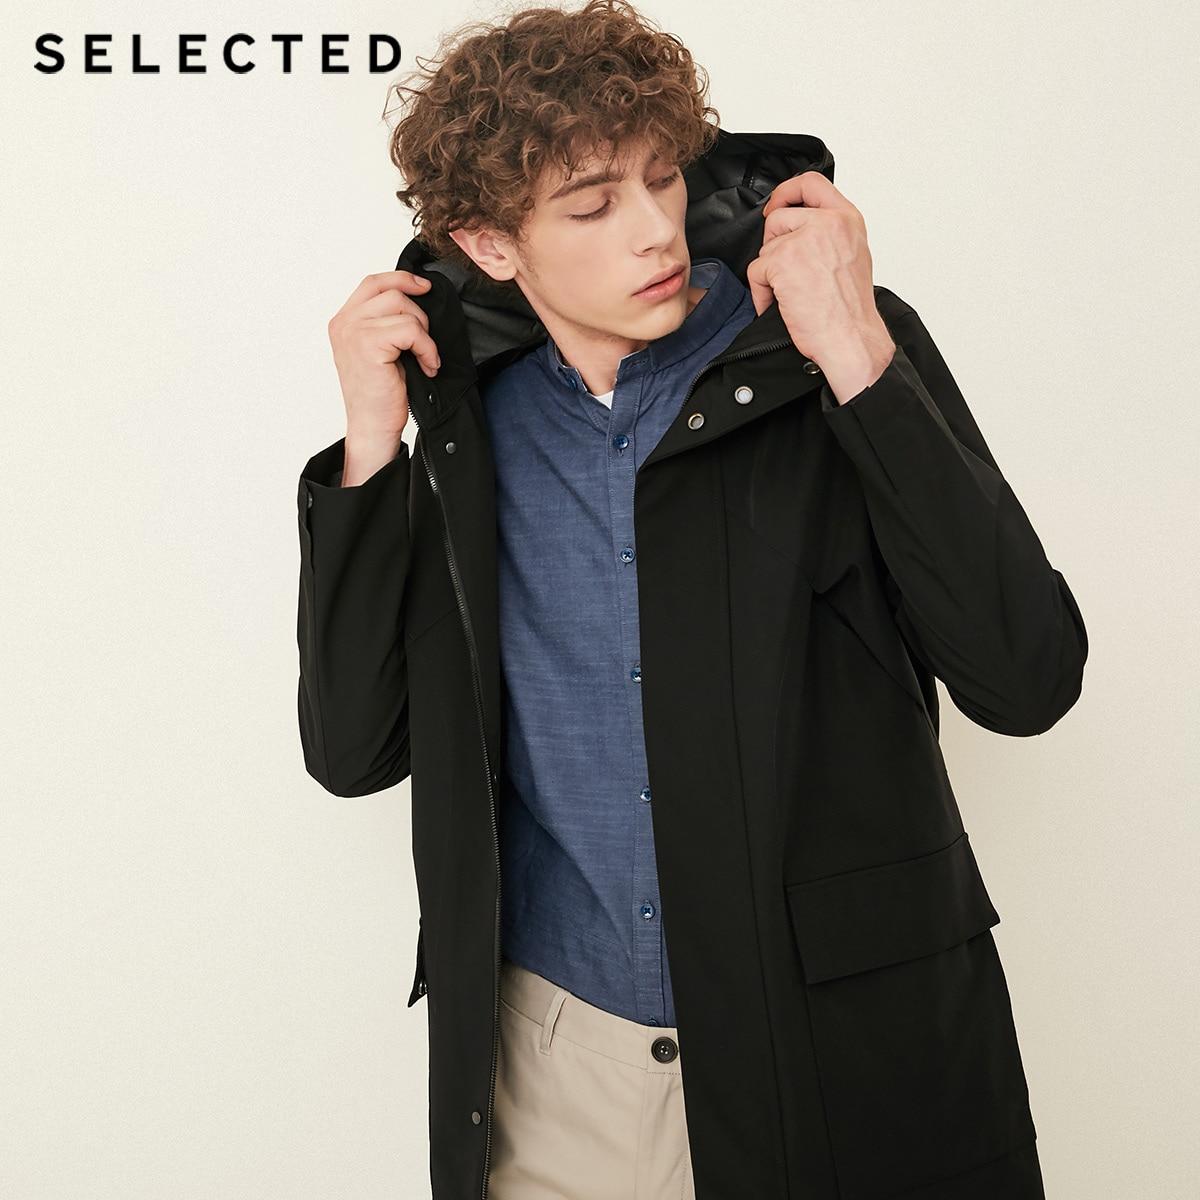 SELECTED, Blackrock's New Male Hooded Fly Opening Outwear S | 4183OM509